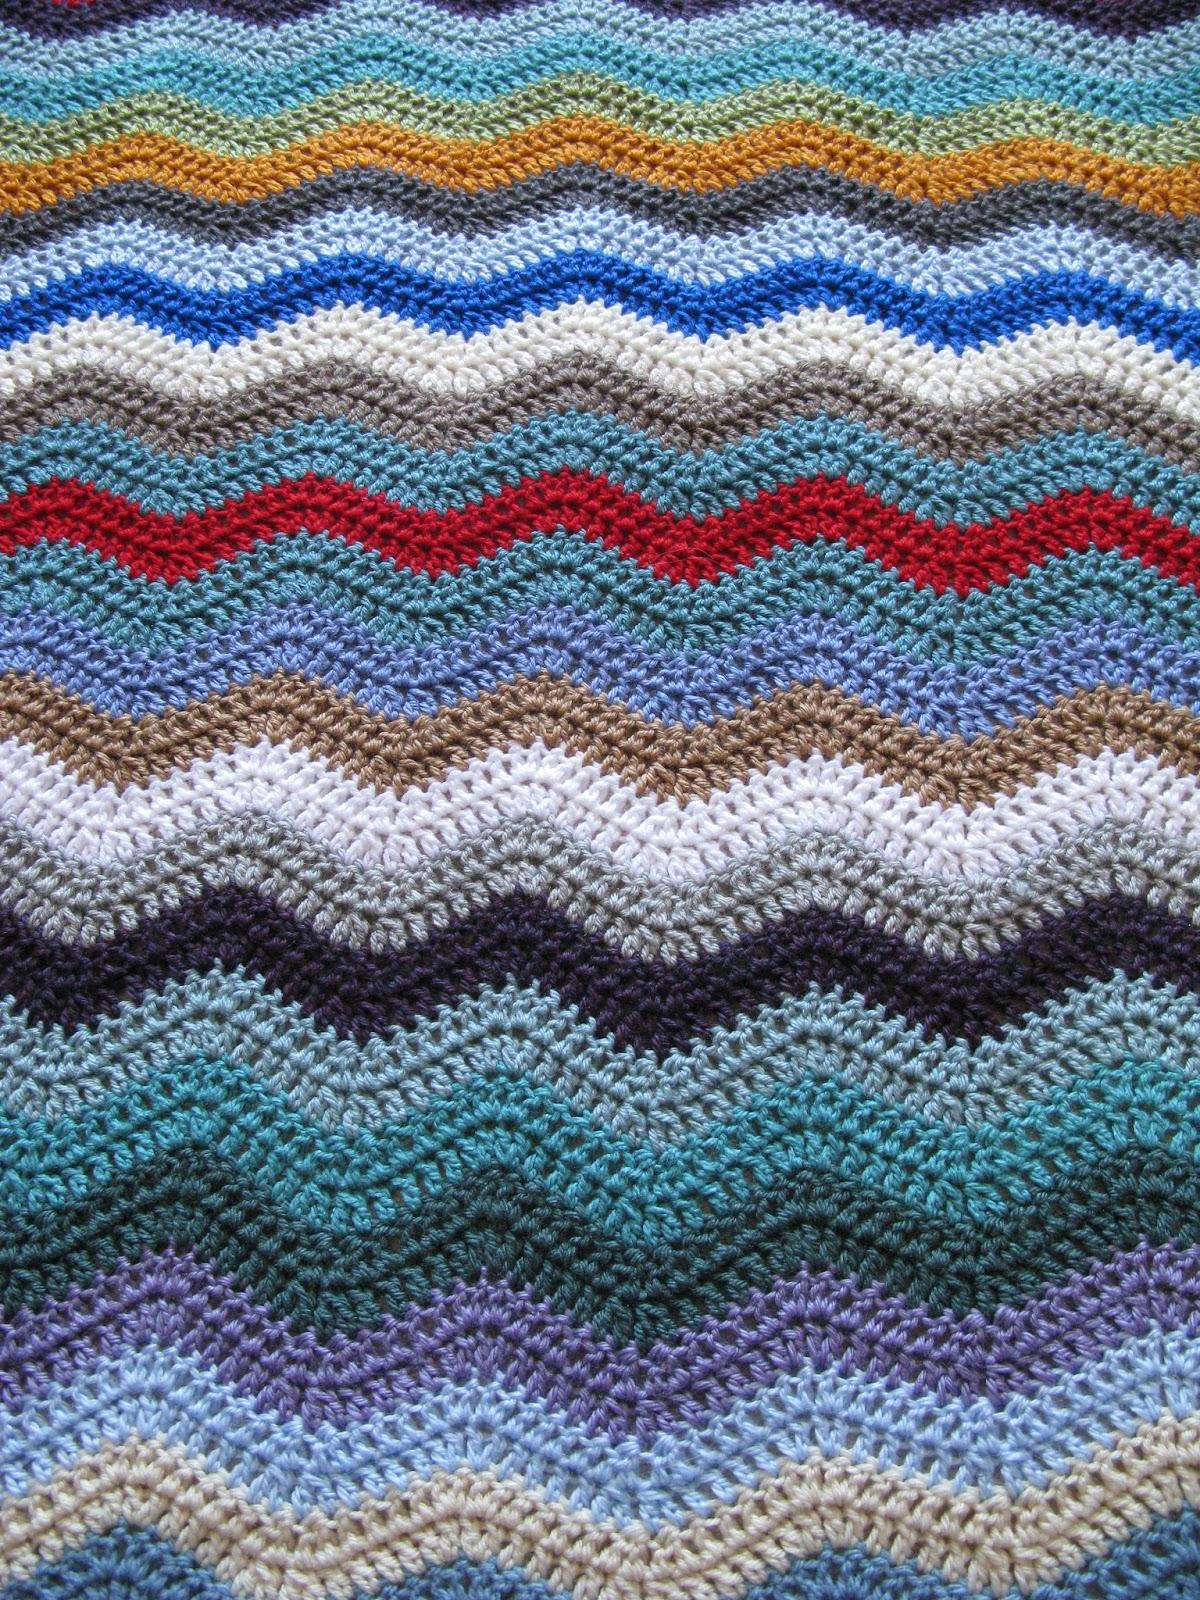 meo my crochet: Stash-Buster Ripple Baby Blanket